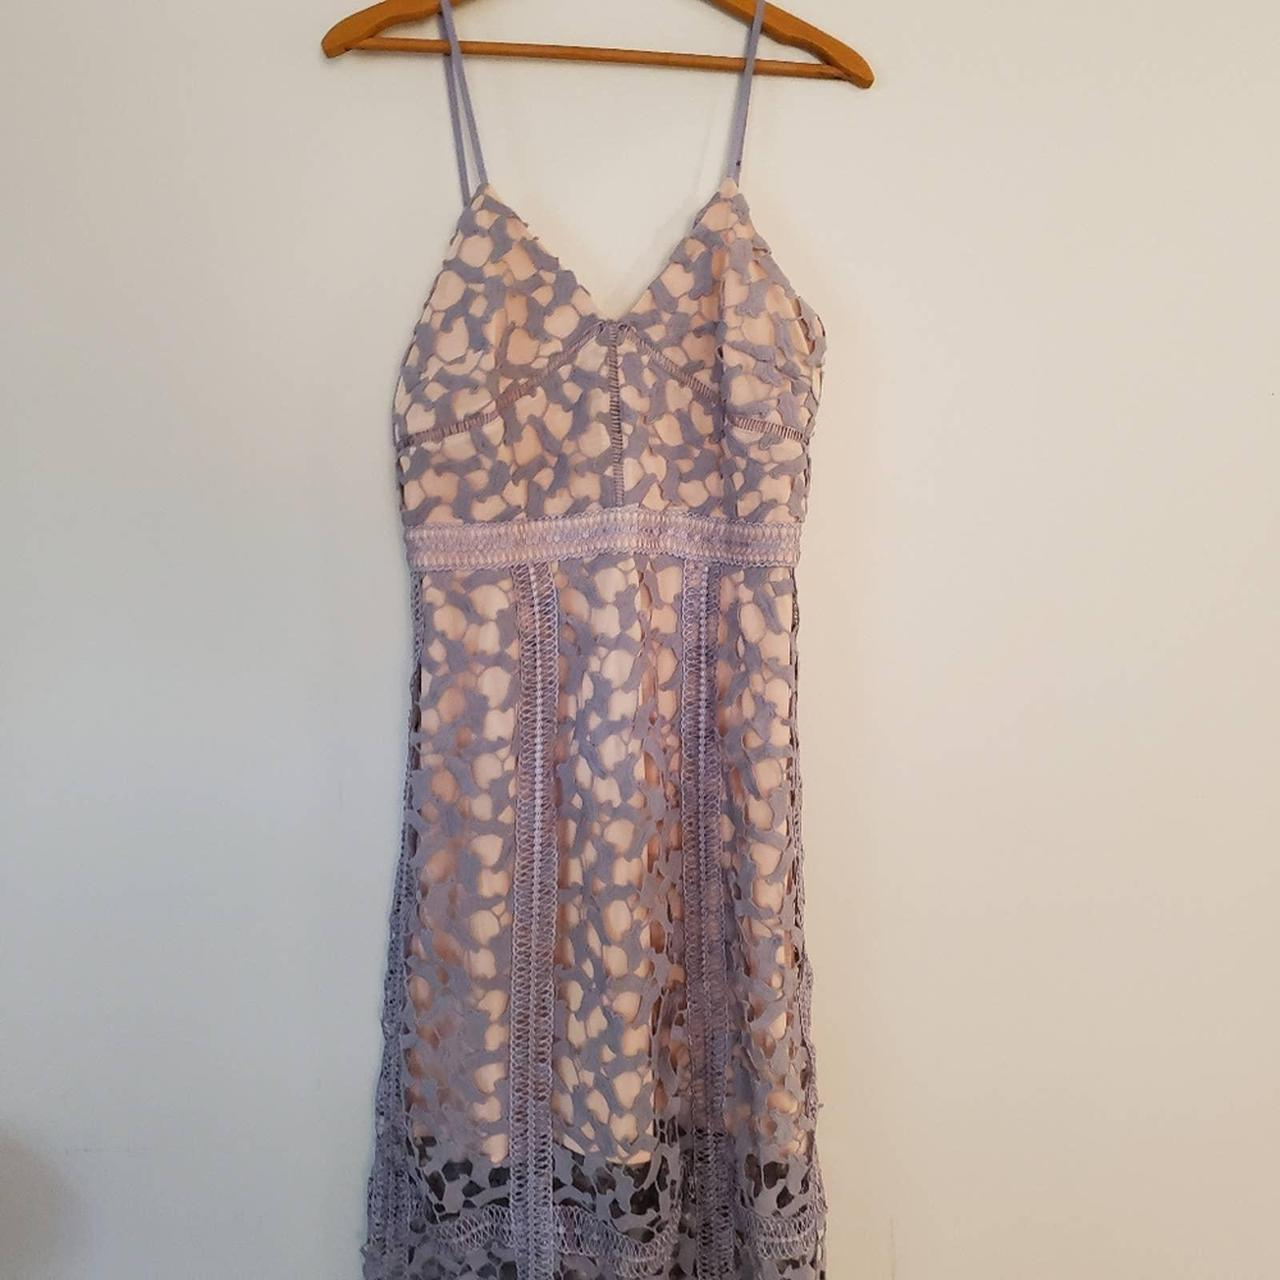 Product Image 1 - Elliatt dress. Lilac lace dress